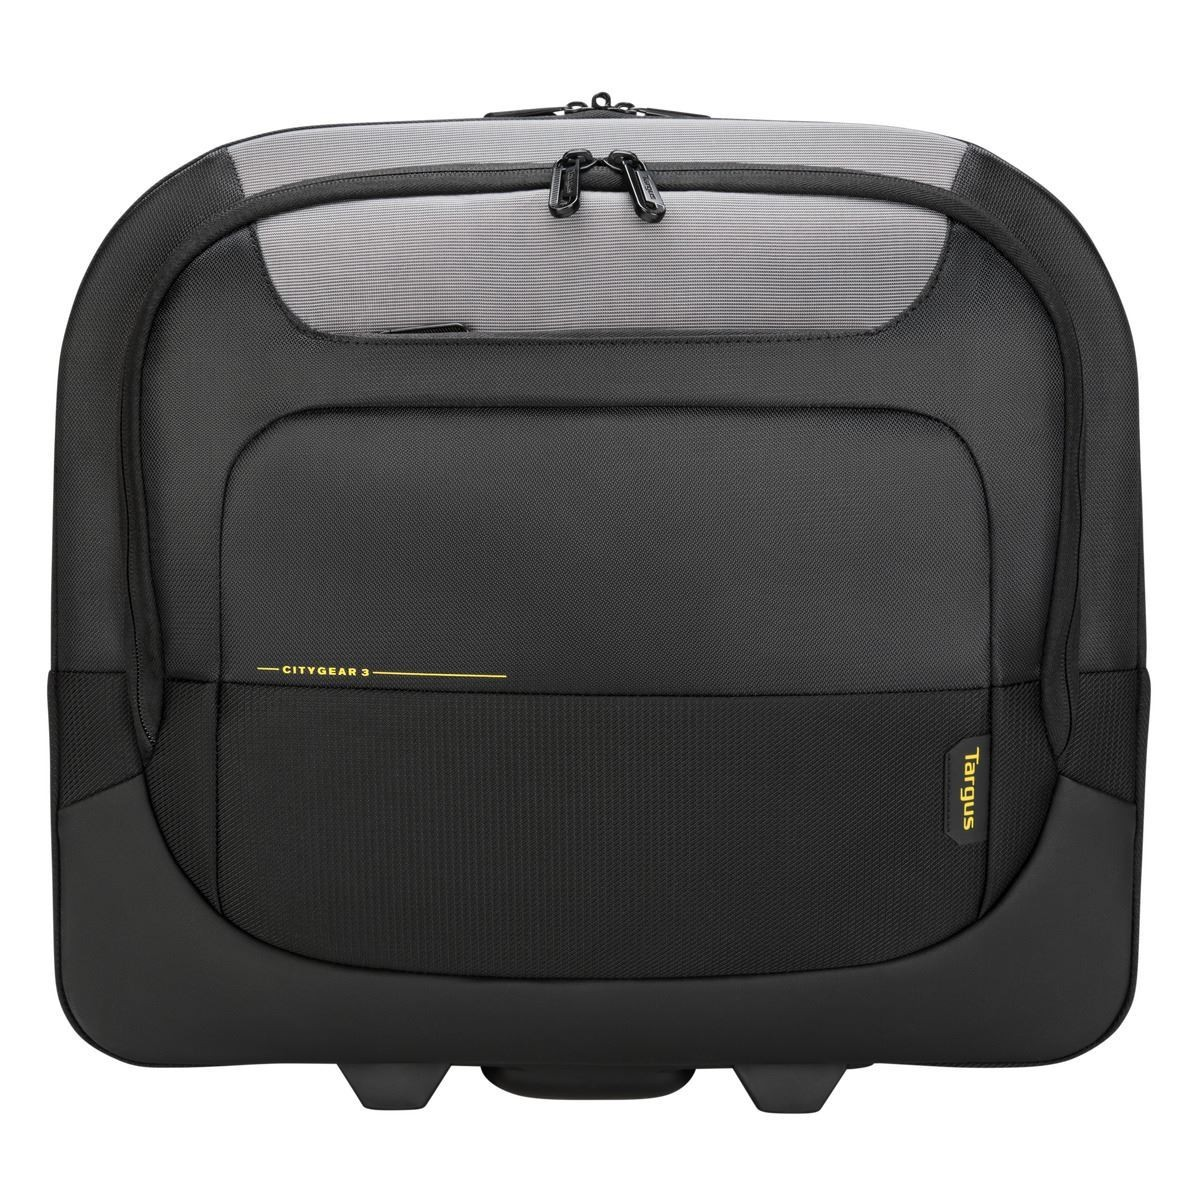 Torba na kółkach do laptopa CityGear 15-17.3cala czarna